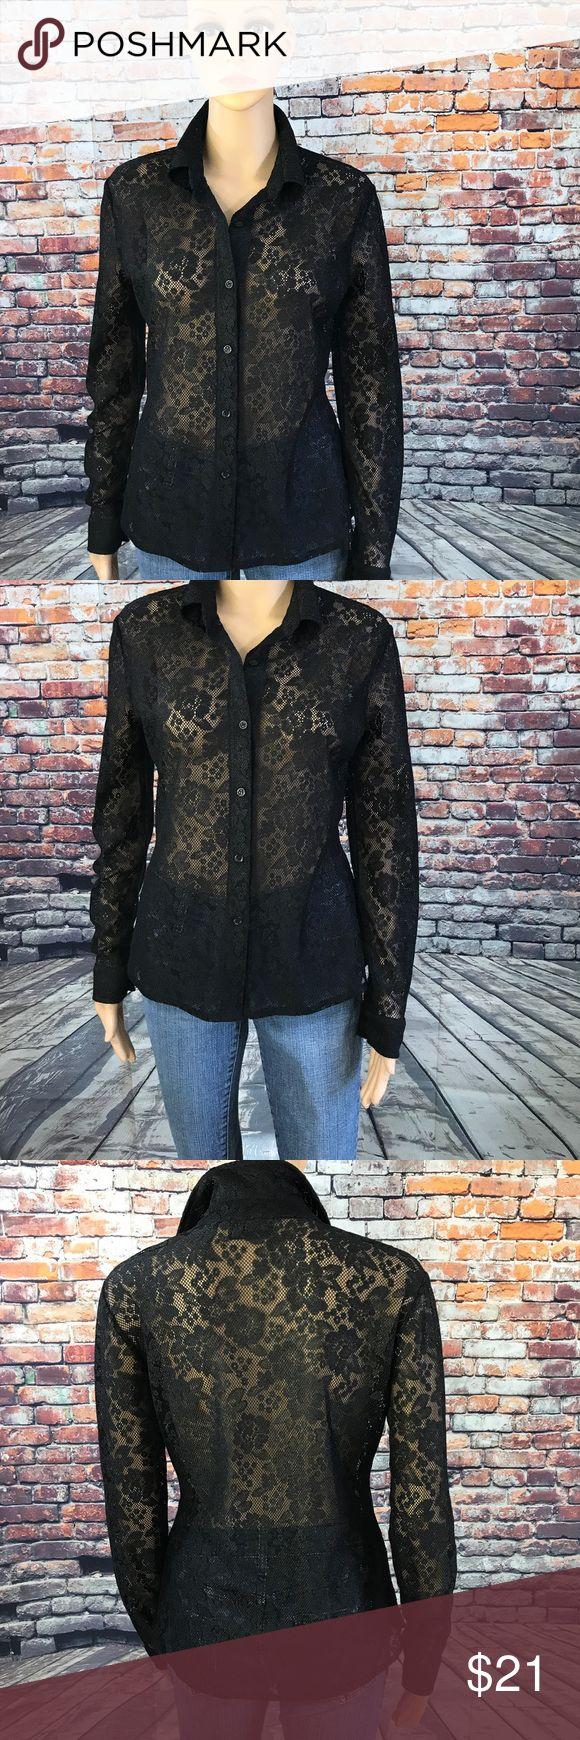 Lace Button Down Shirt Lace Button Down Shirt  68% Polyester  29% Nylon  3% Spandex New York & Company Tops Button Down Shirts